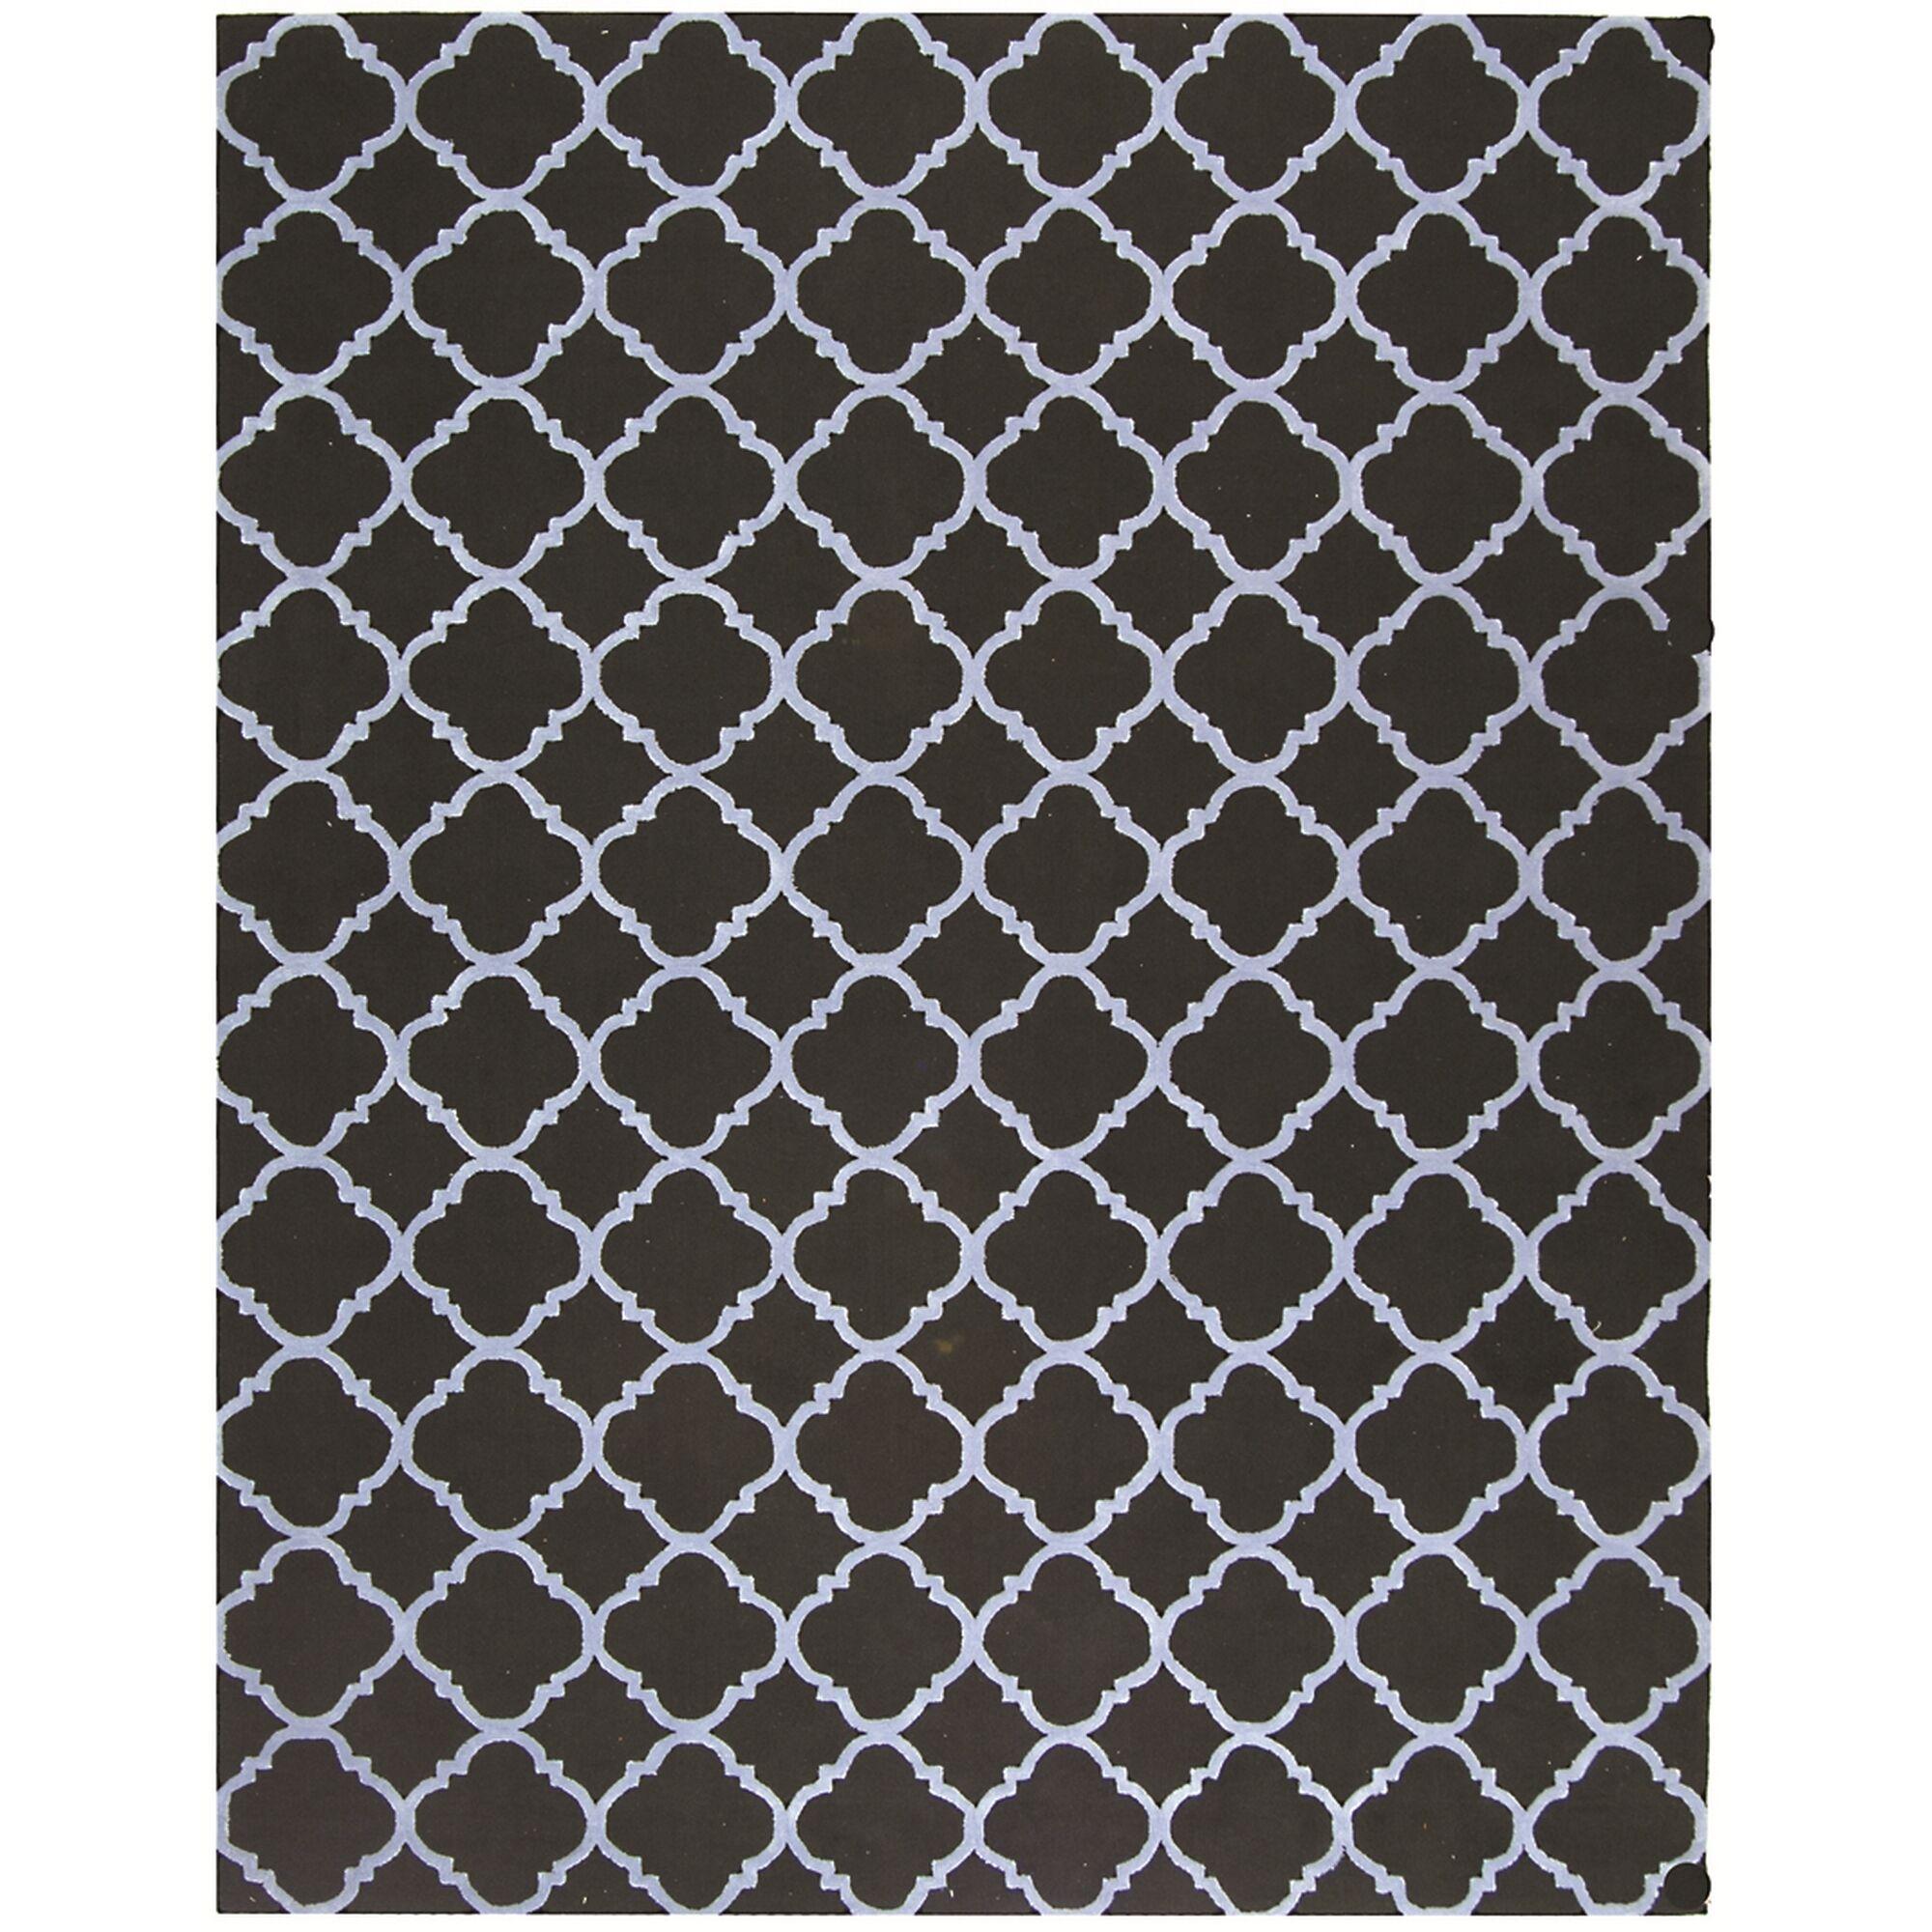 Fullerton Black/Blue Geometric Area Rug Rug Size: Rectangle 7'9